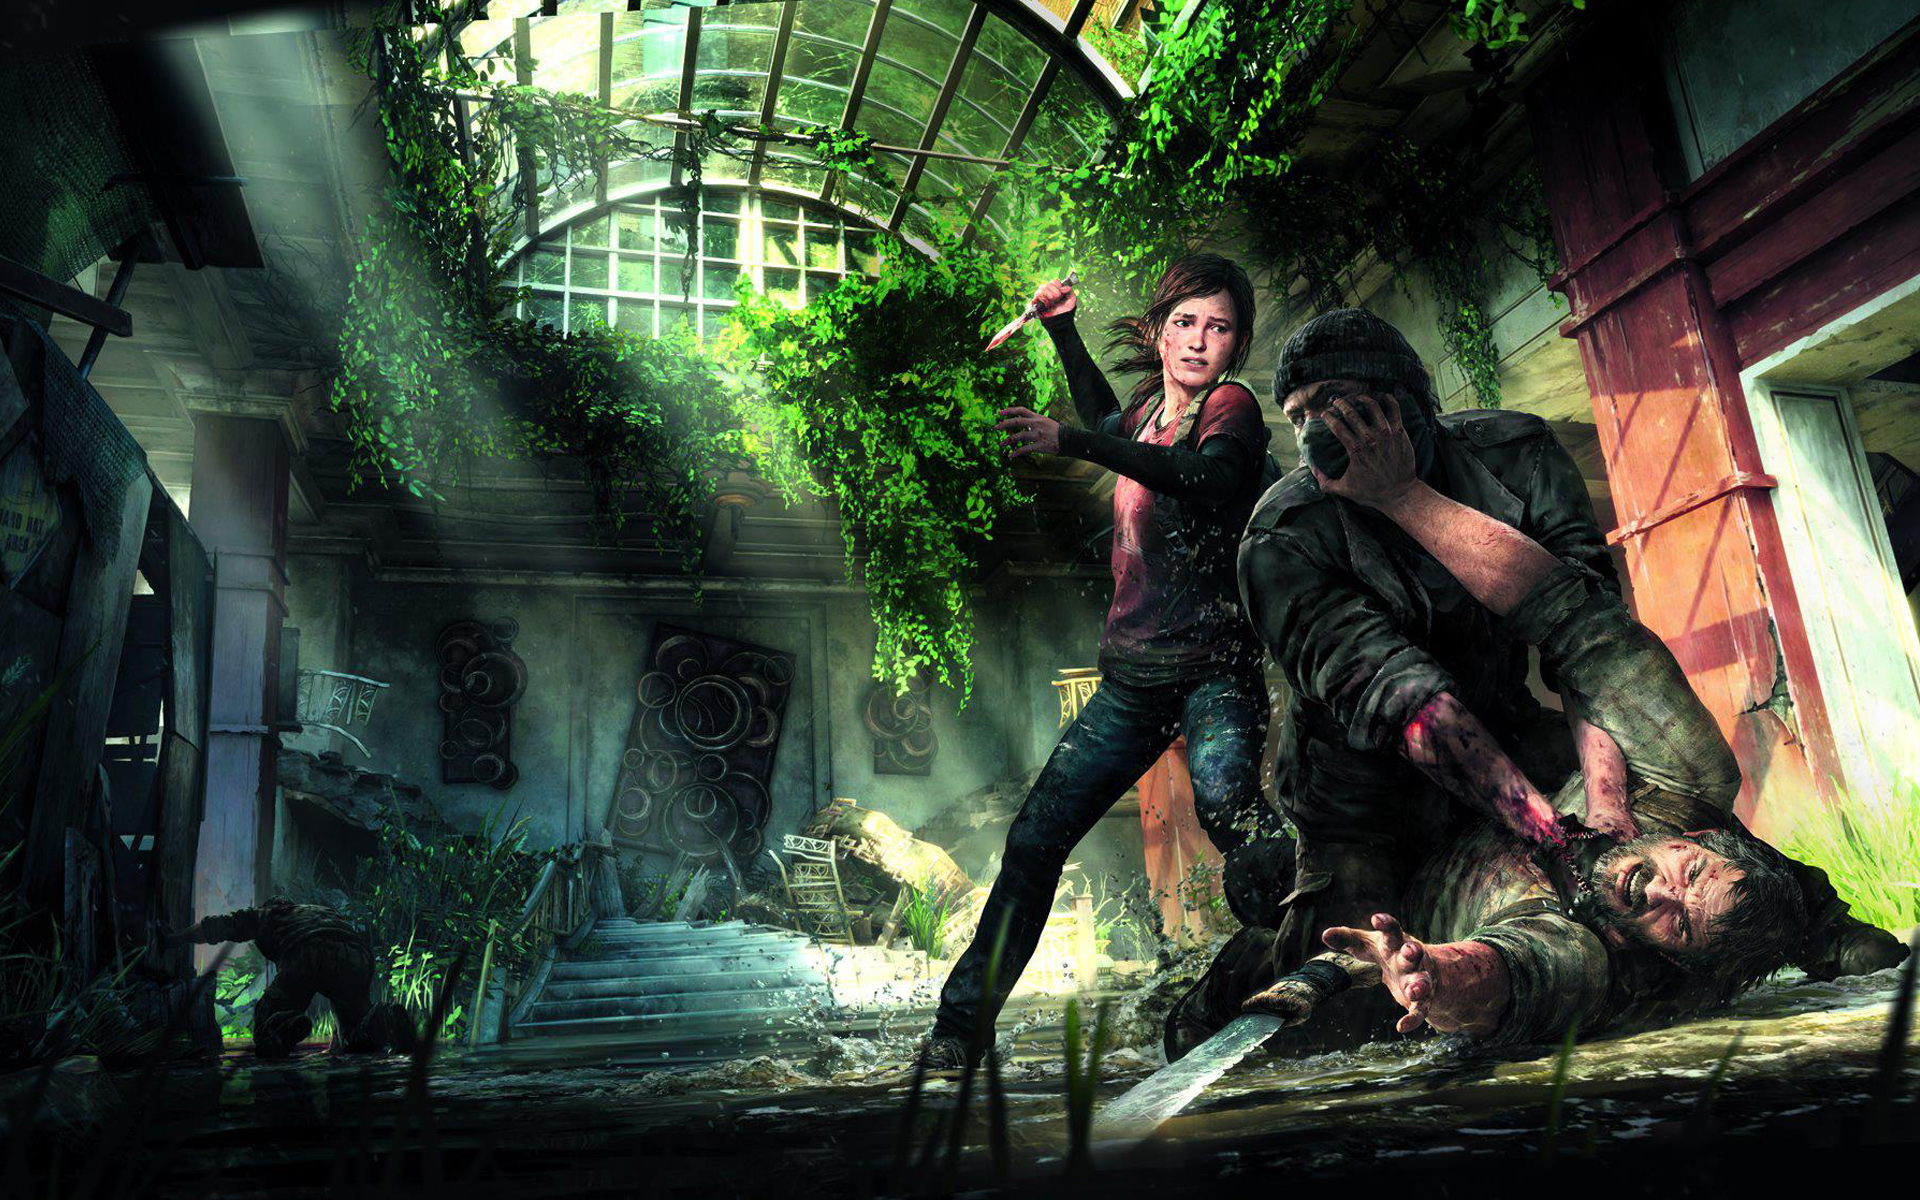 The Last of Us Wallpaper Desktop   Wallpup.com